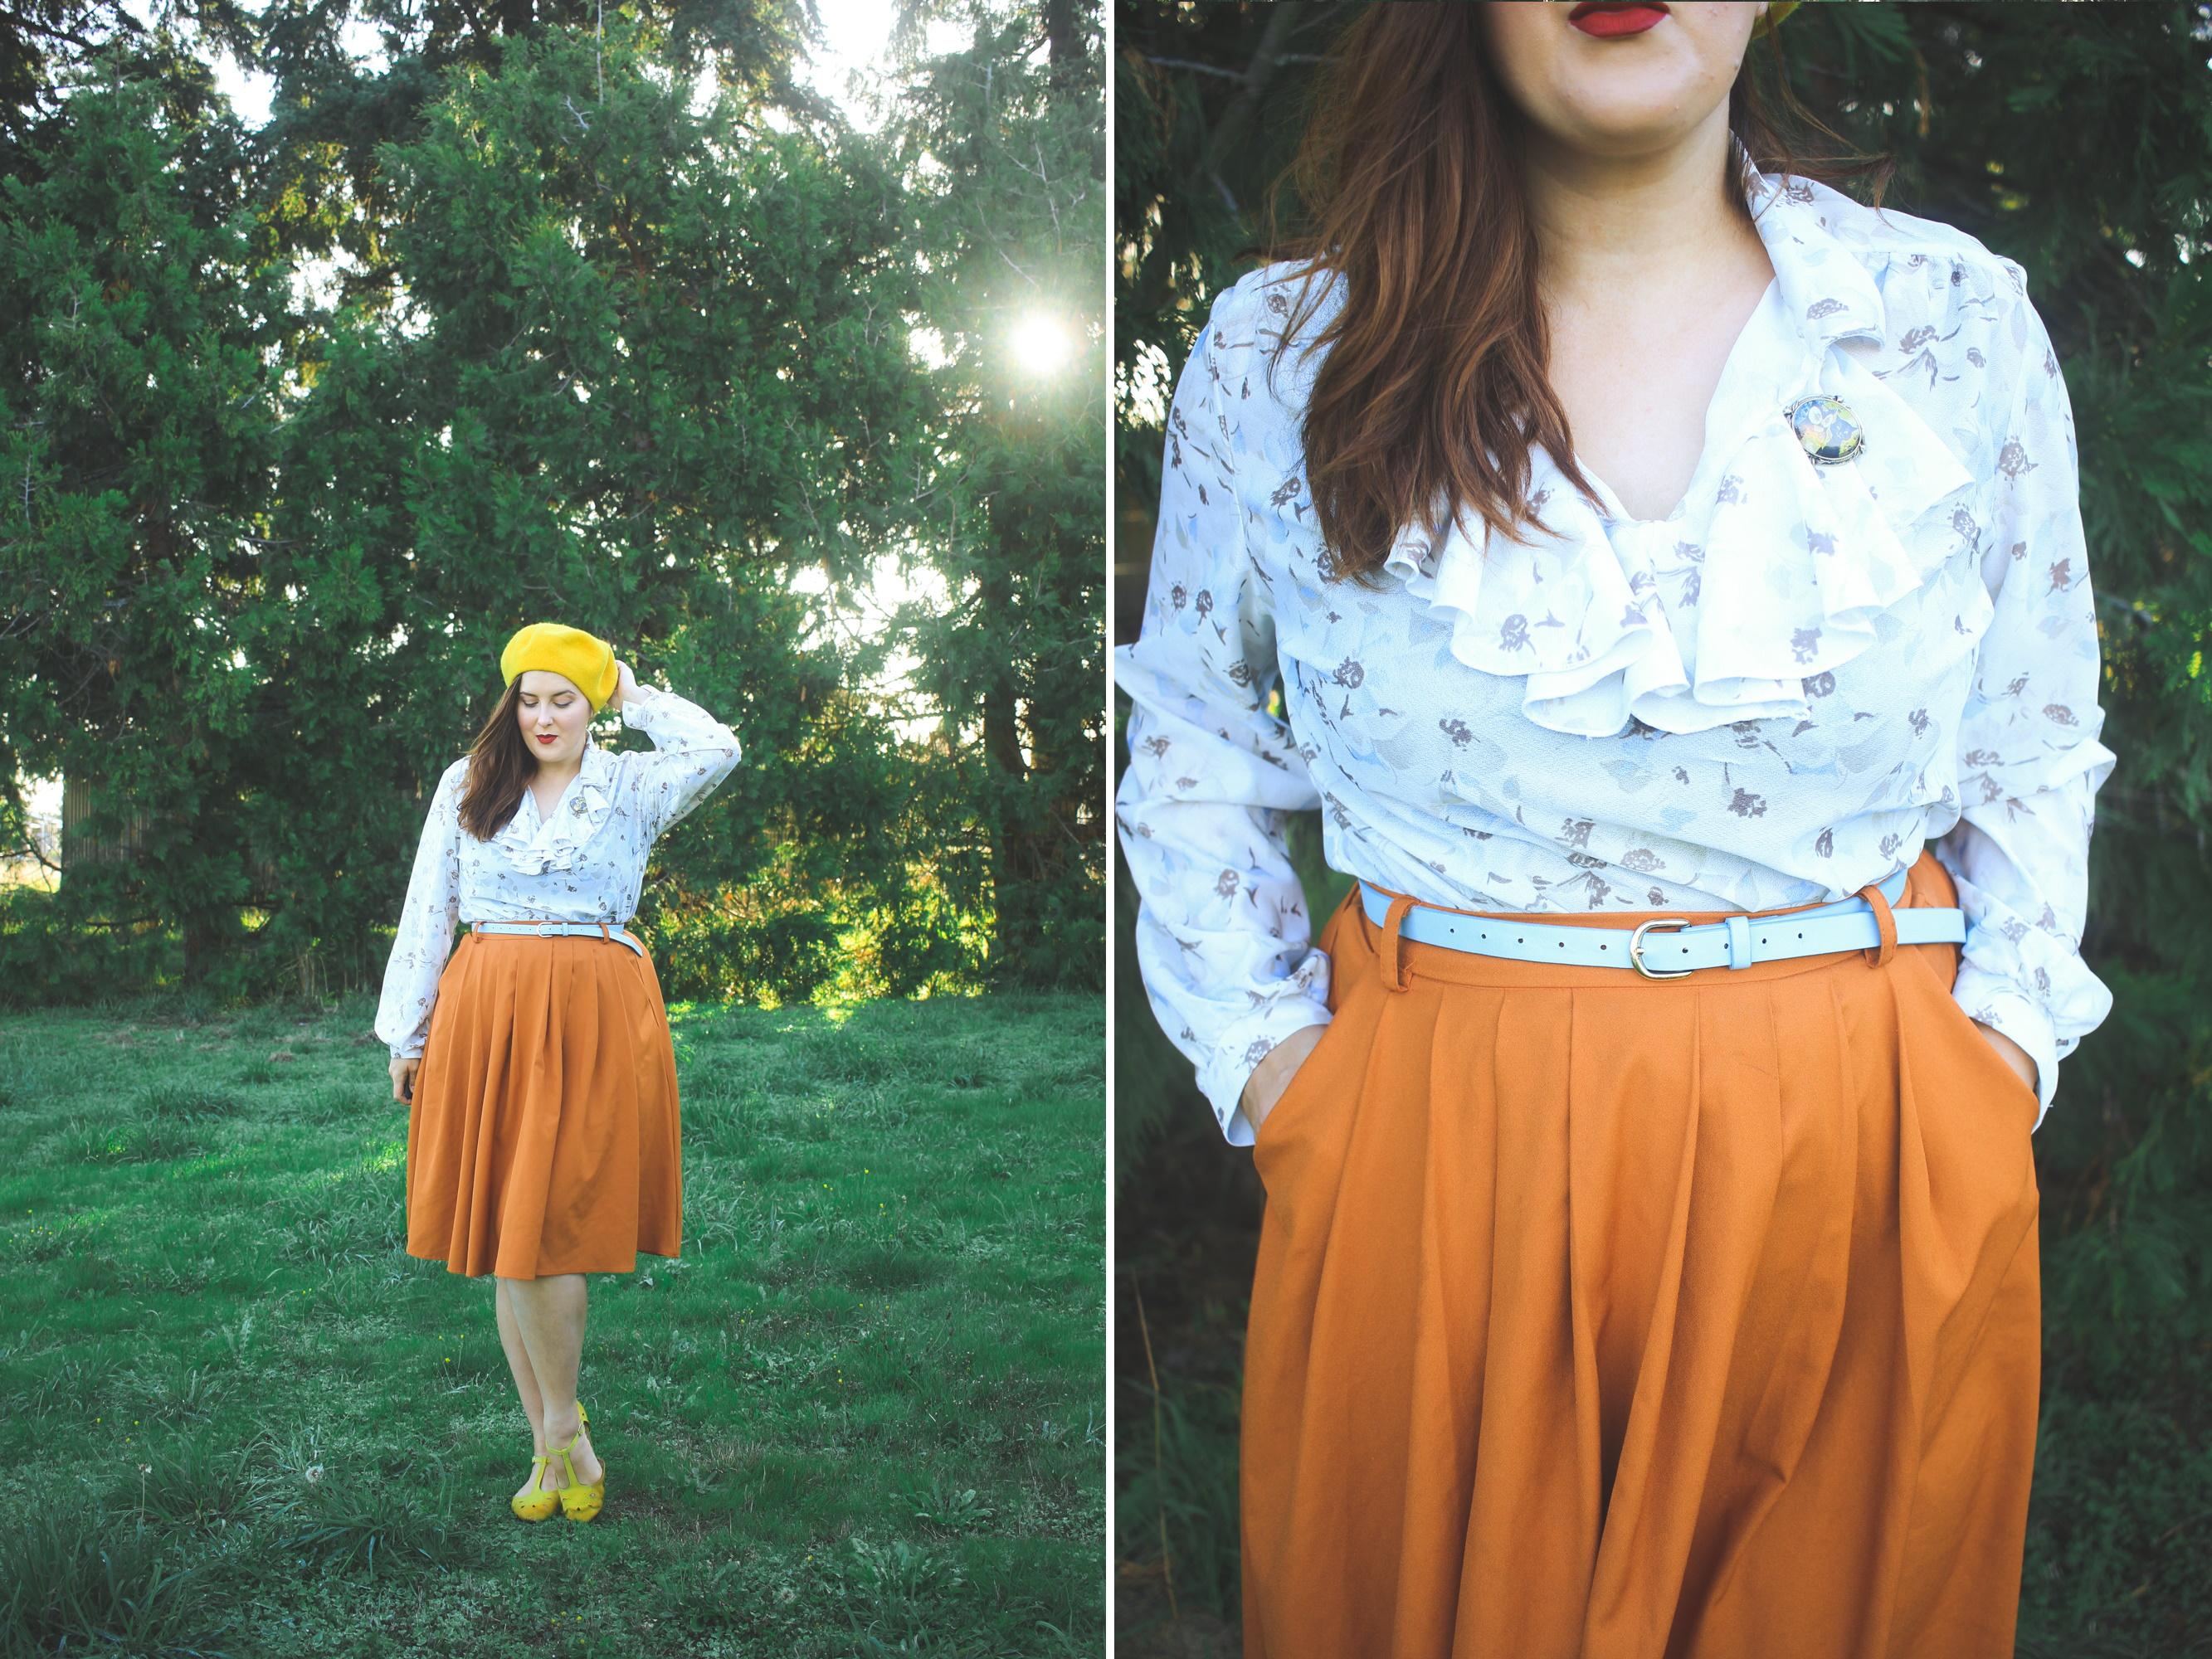 woman wearing a ruffled blouse and orange skirt